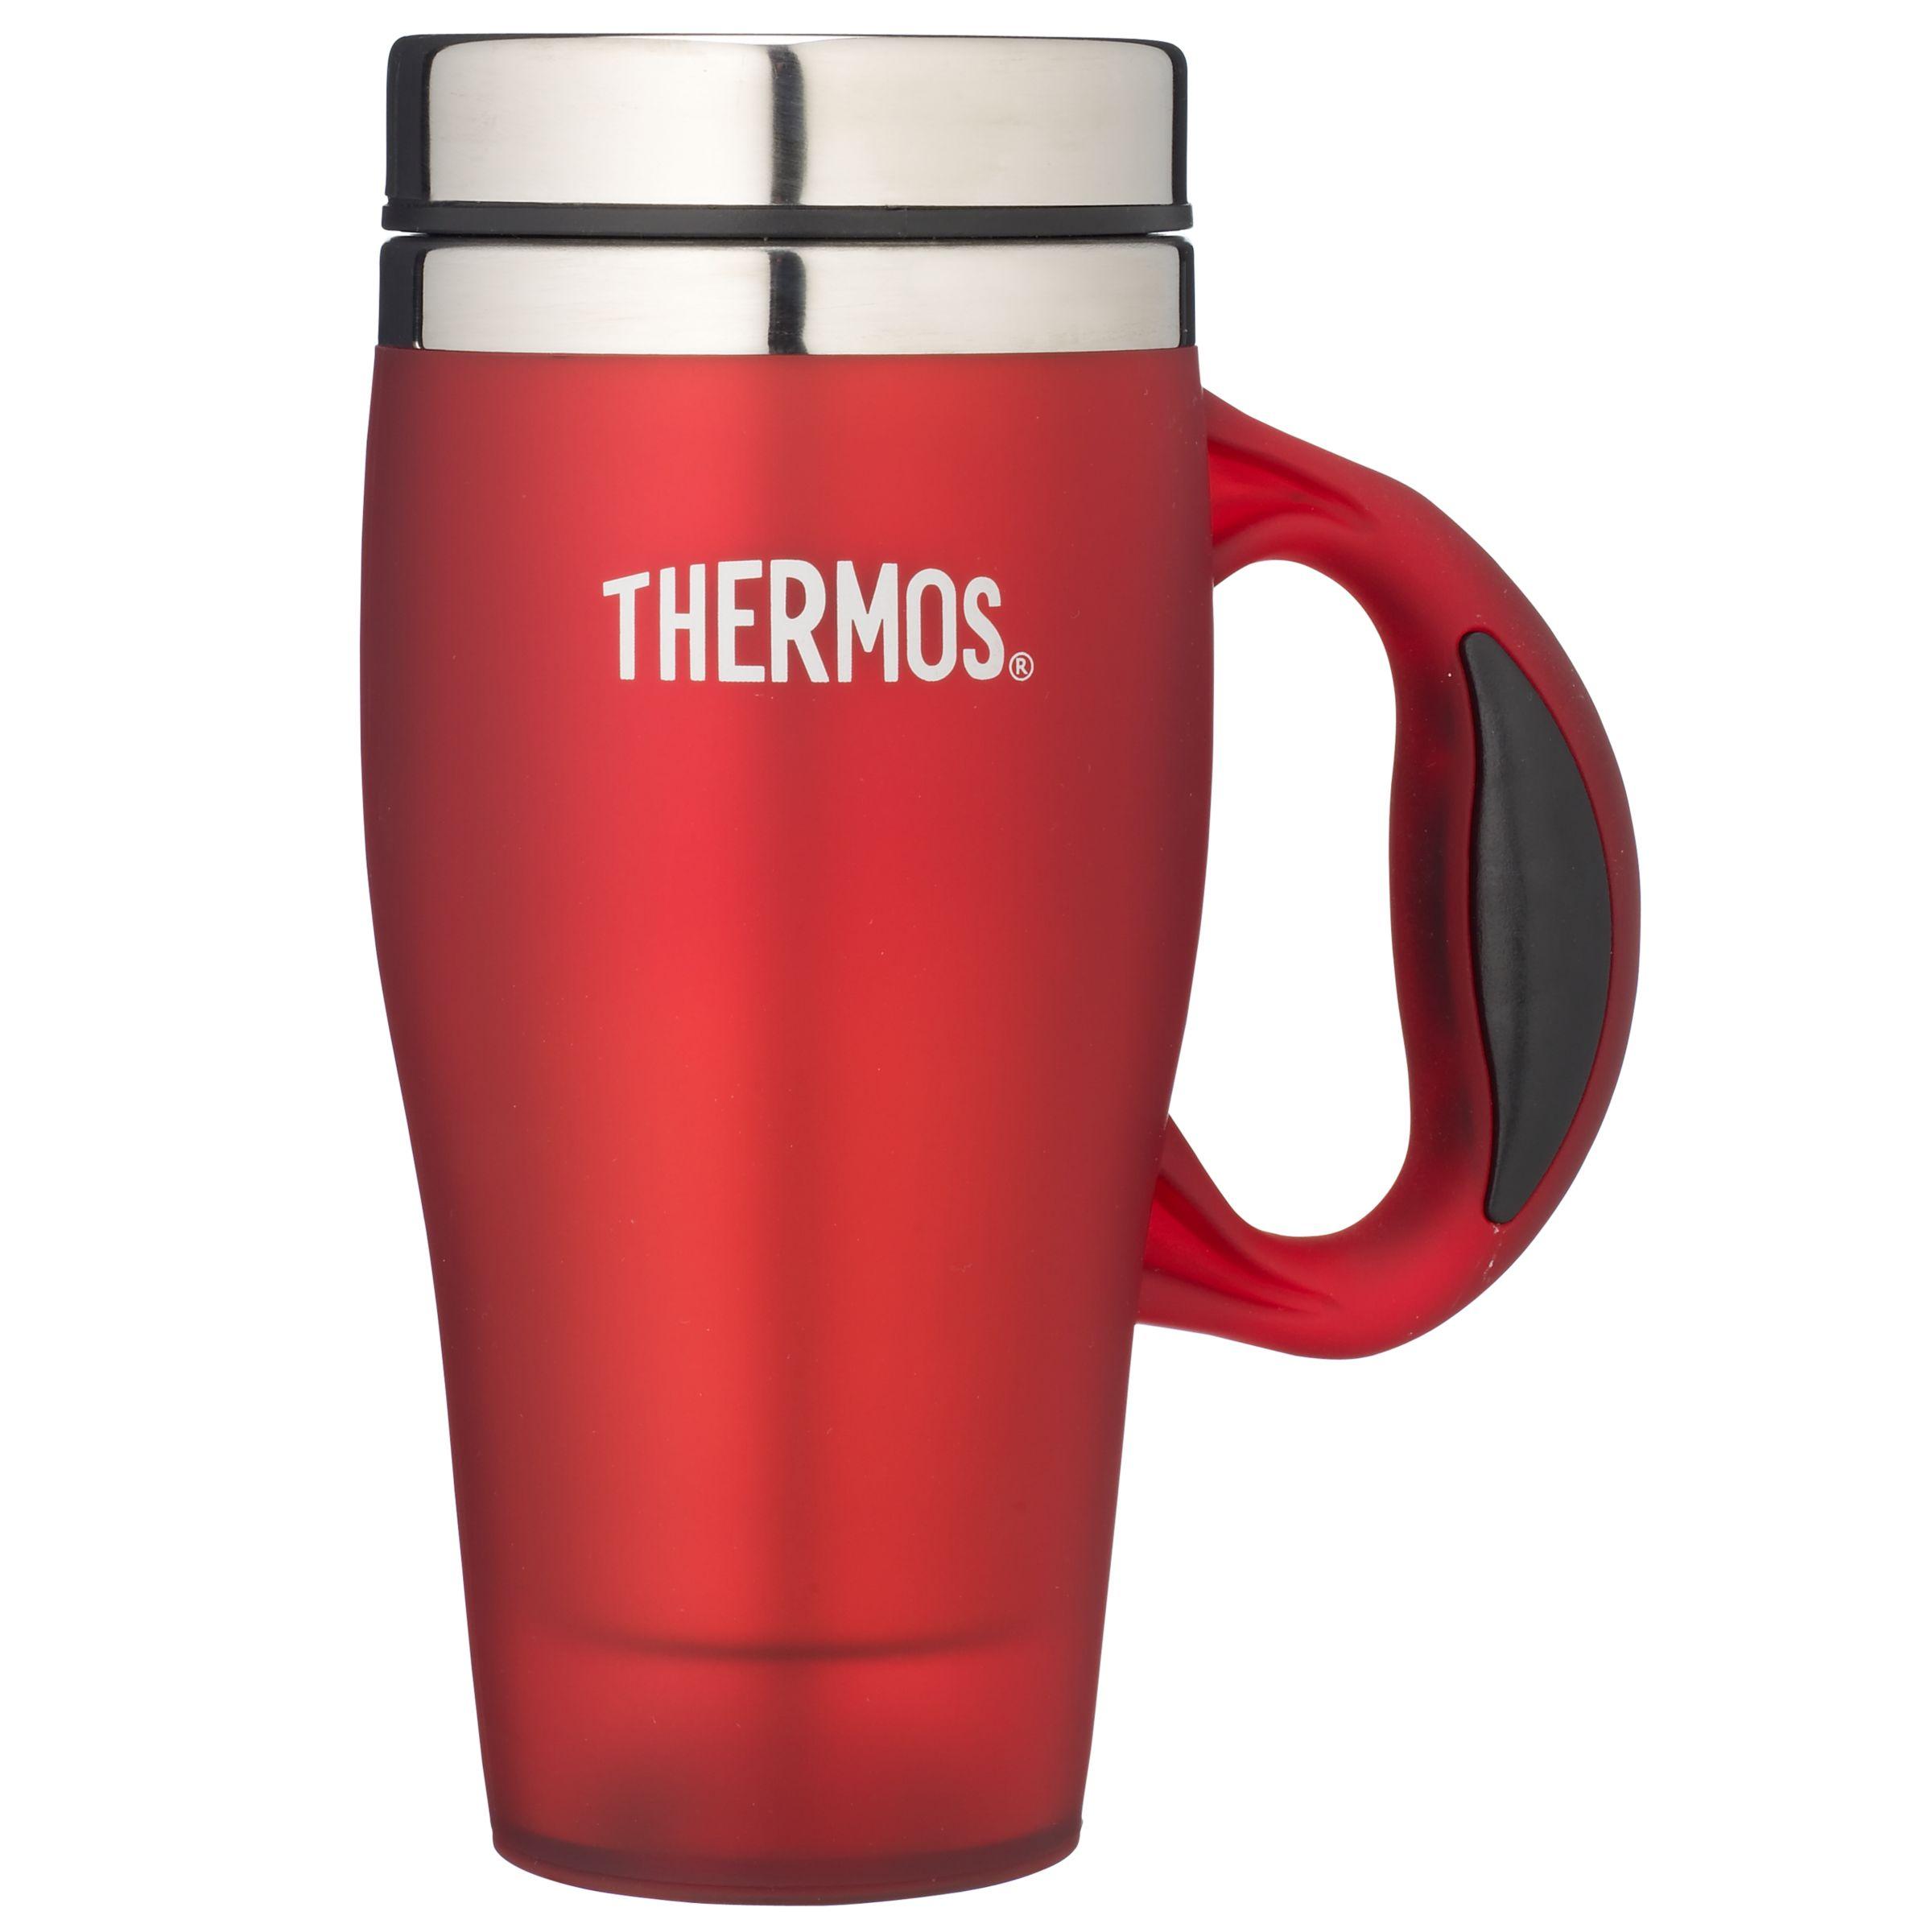 Thermos Travel Mug, Red